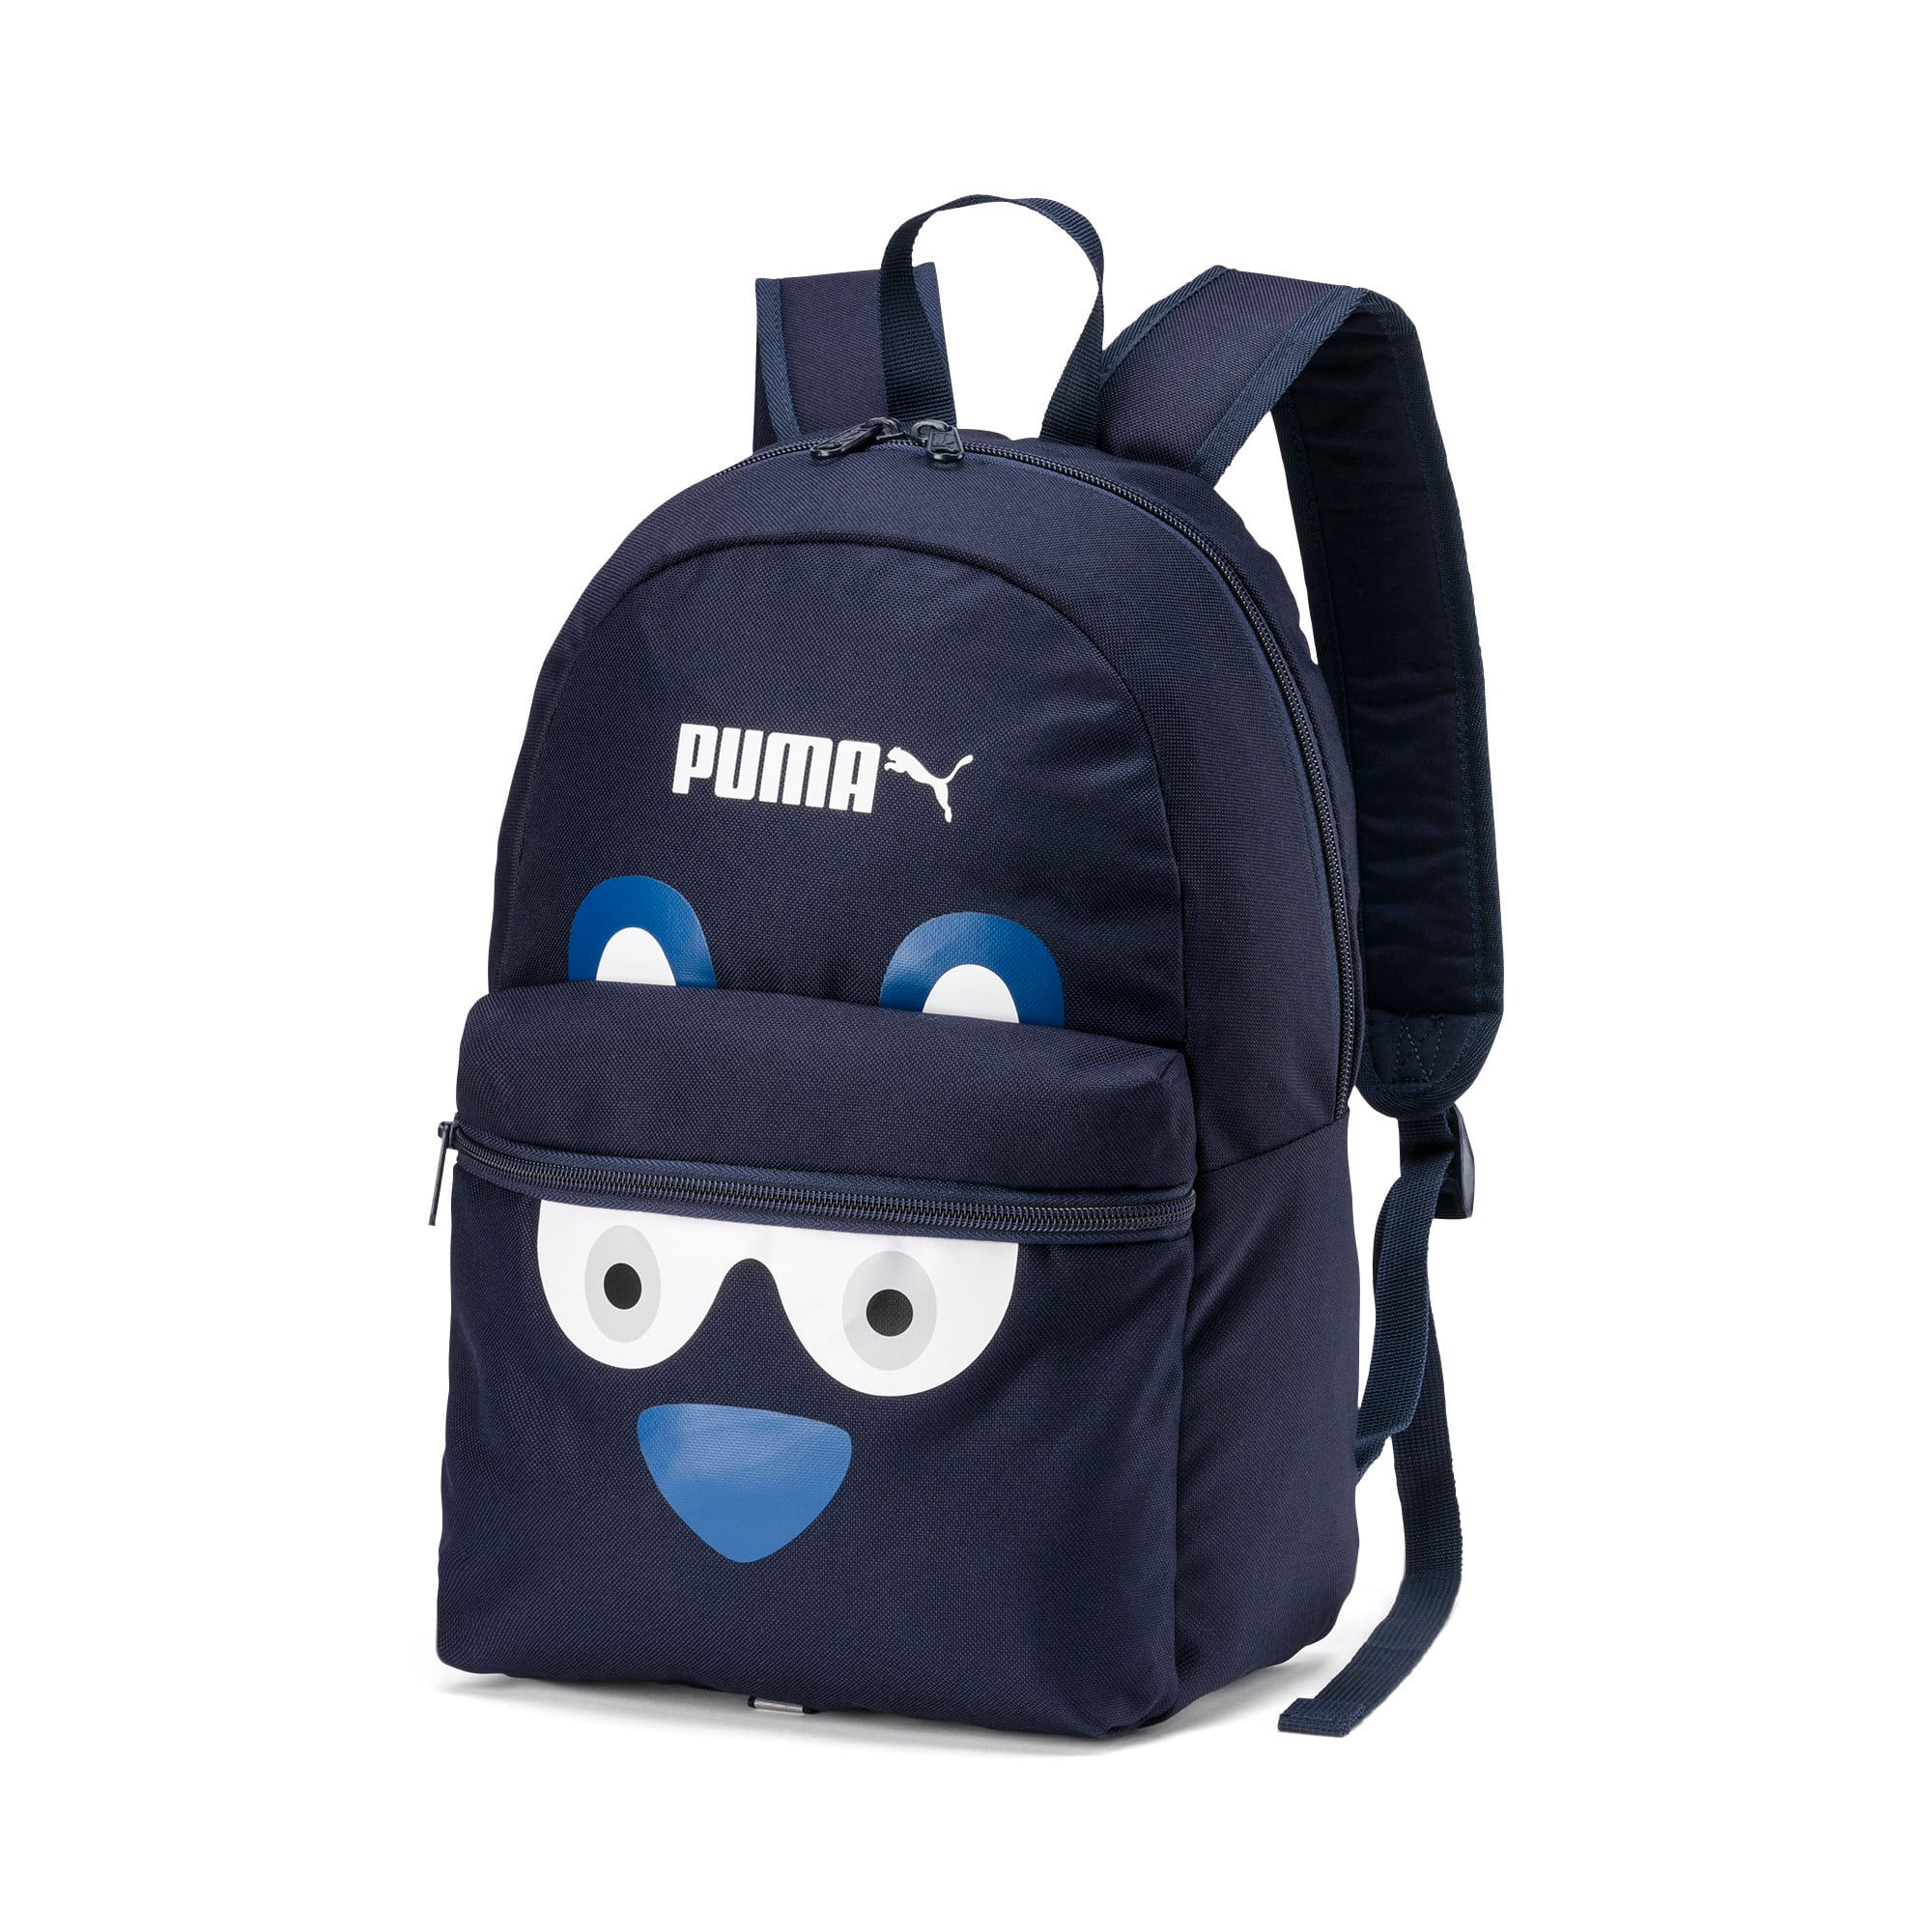 PUMA Monster rugzak, Blauw